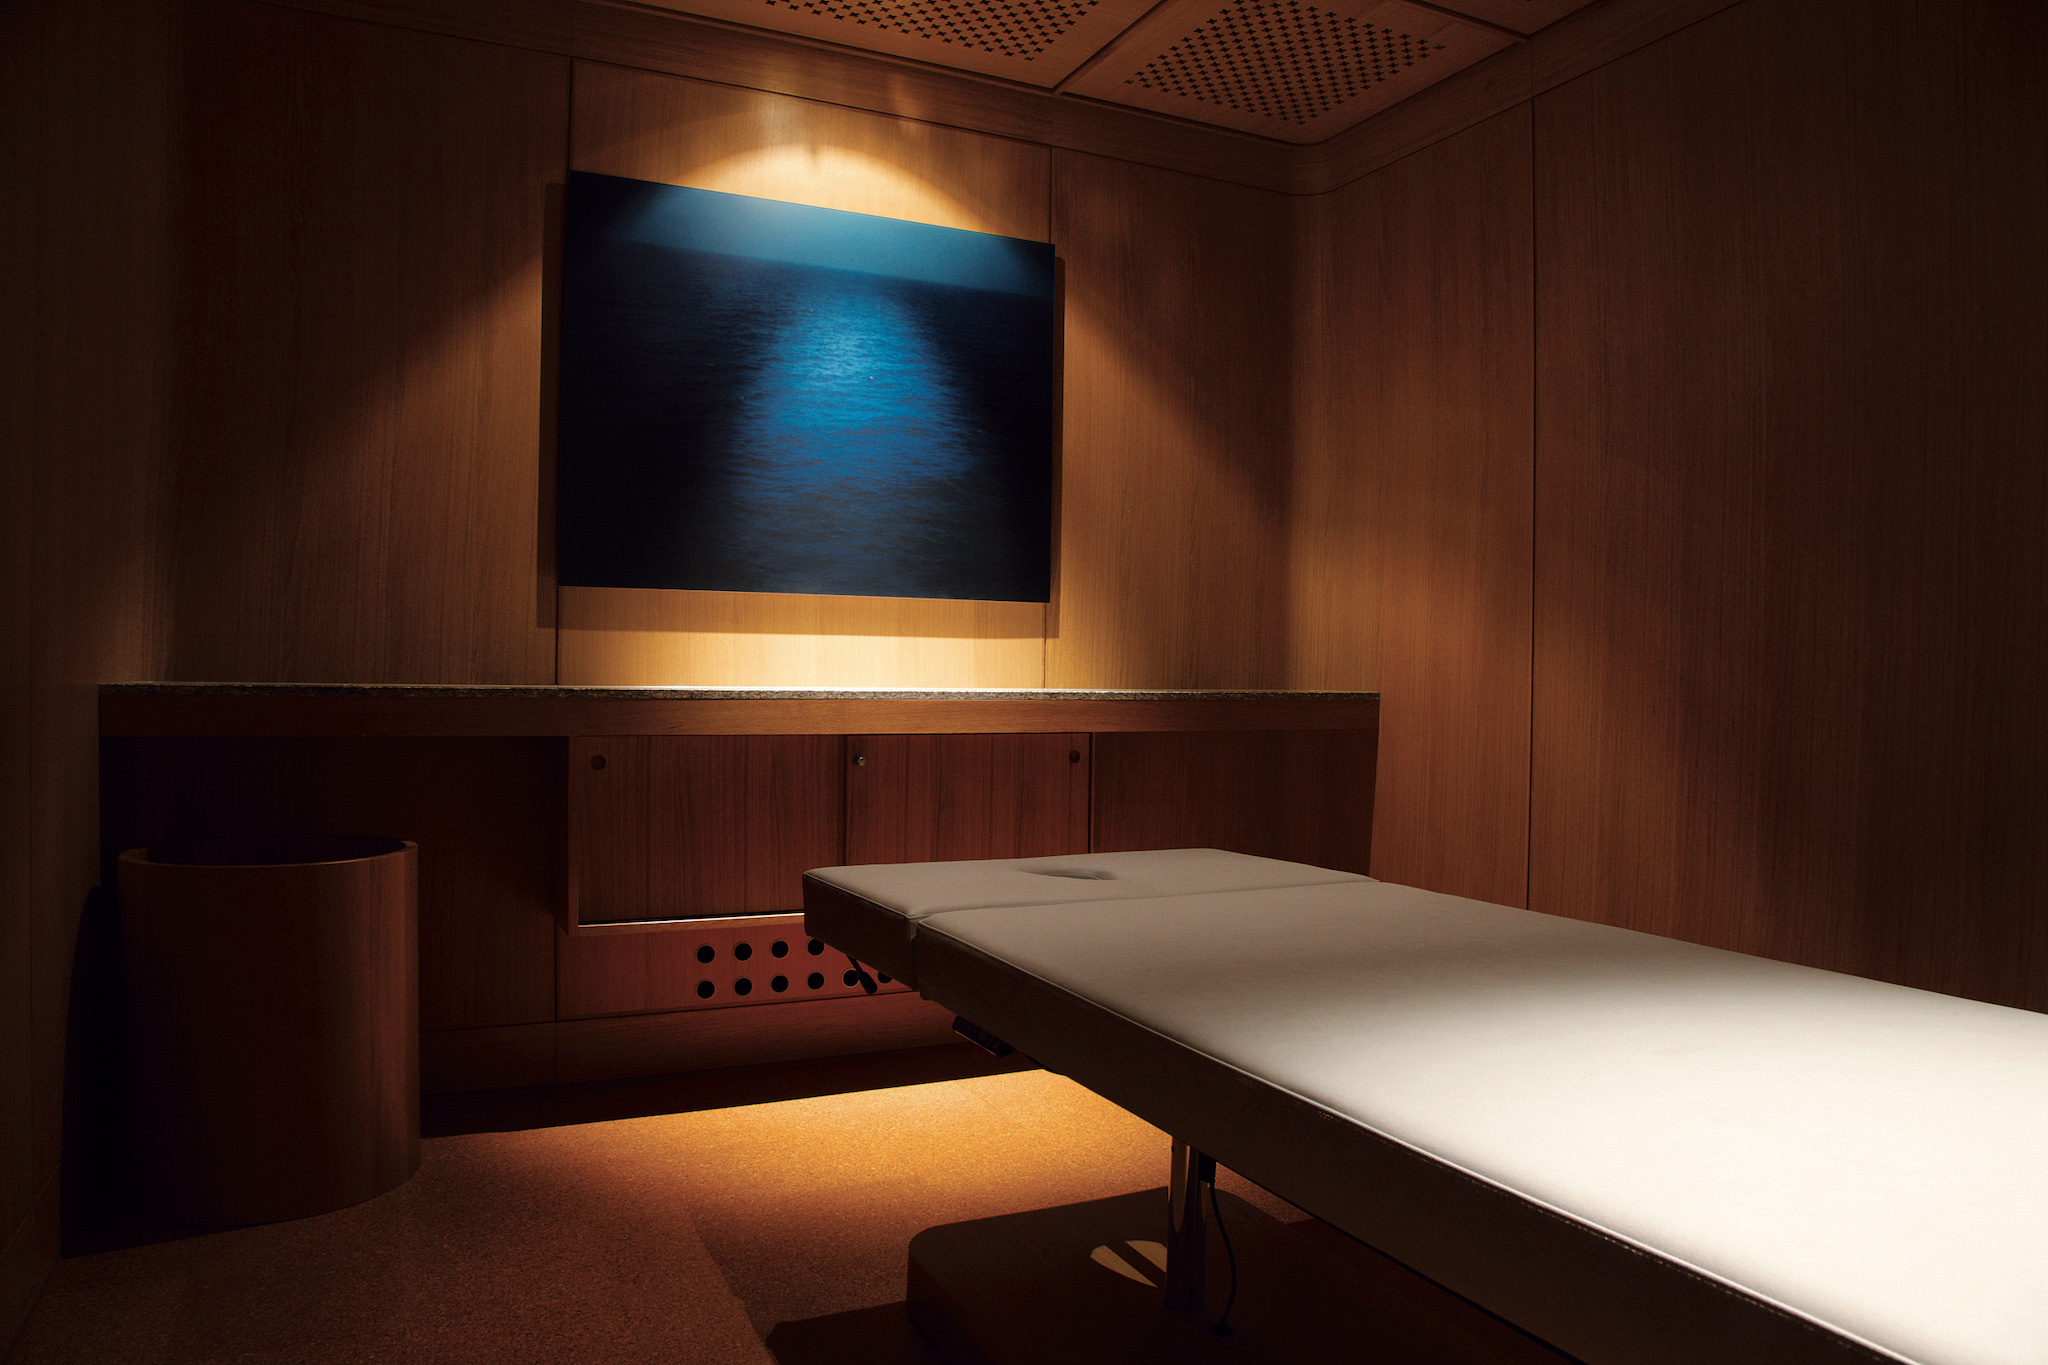 The Omnia, massage table